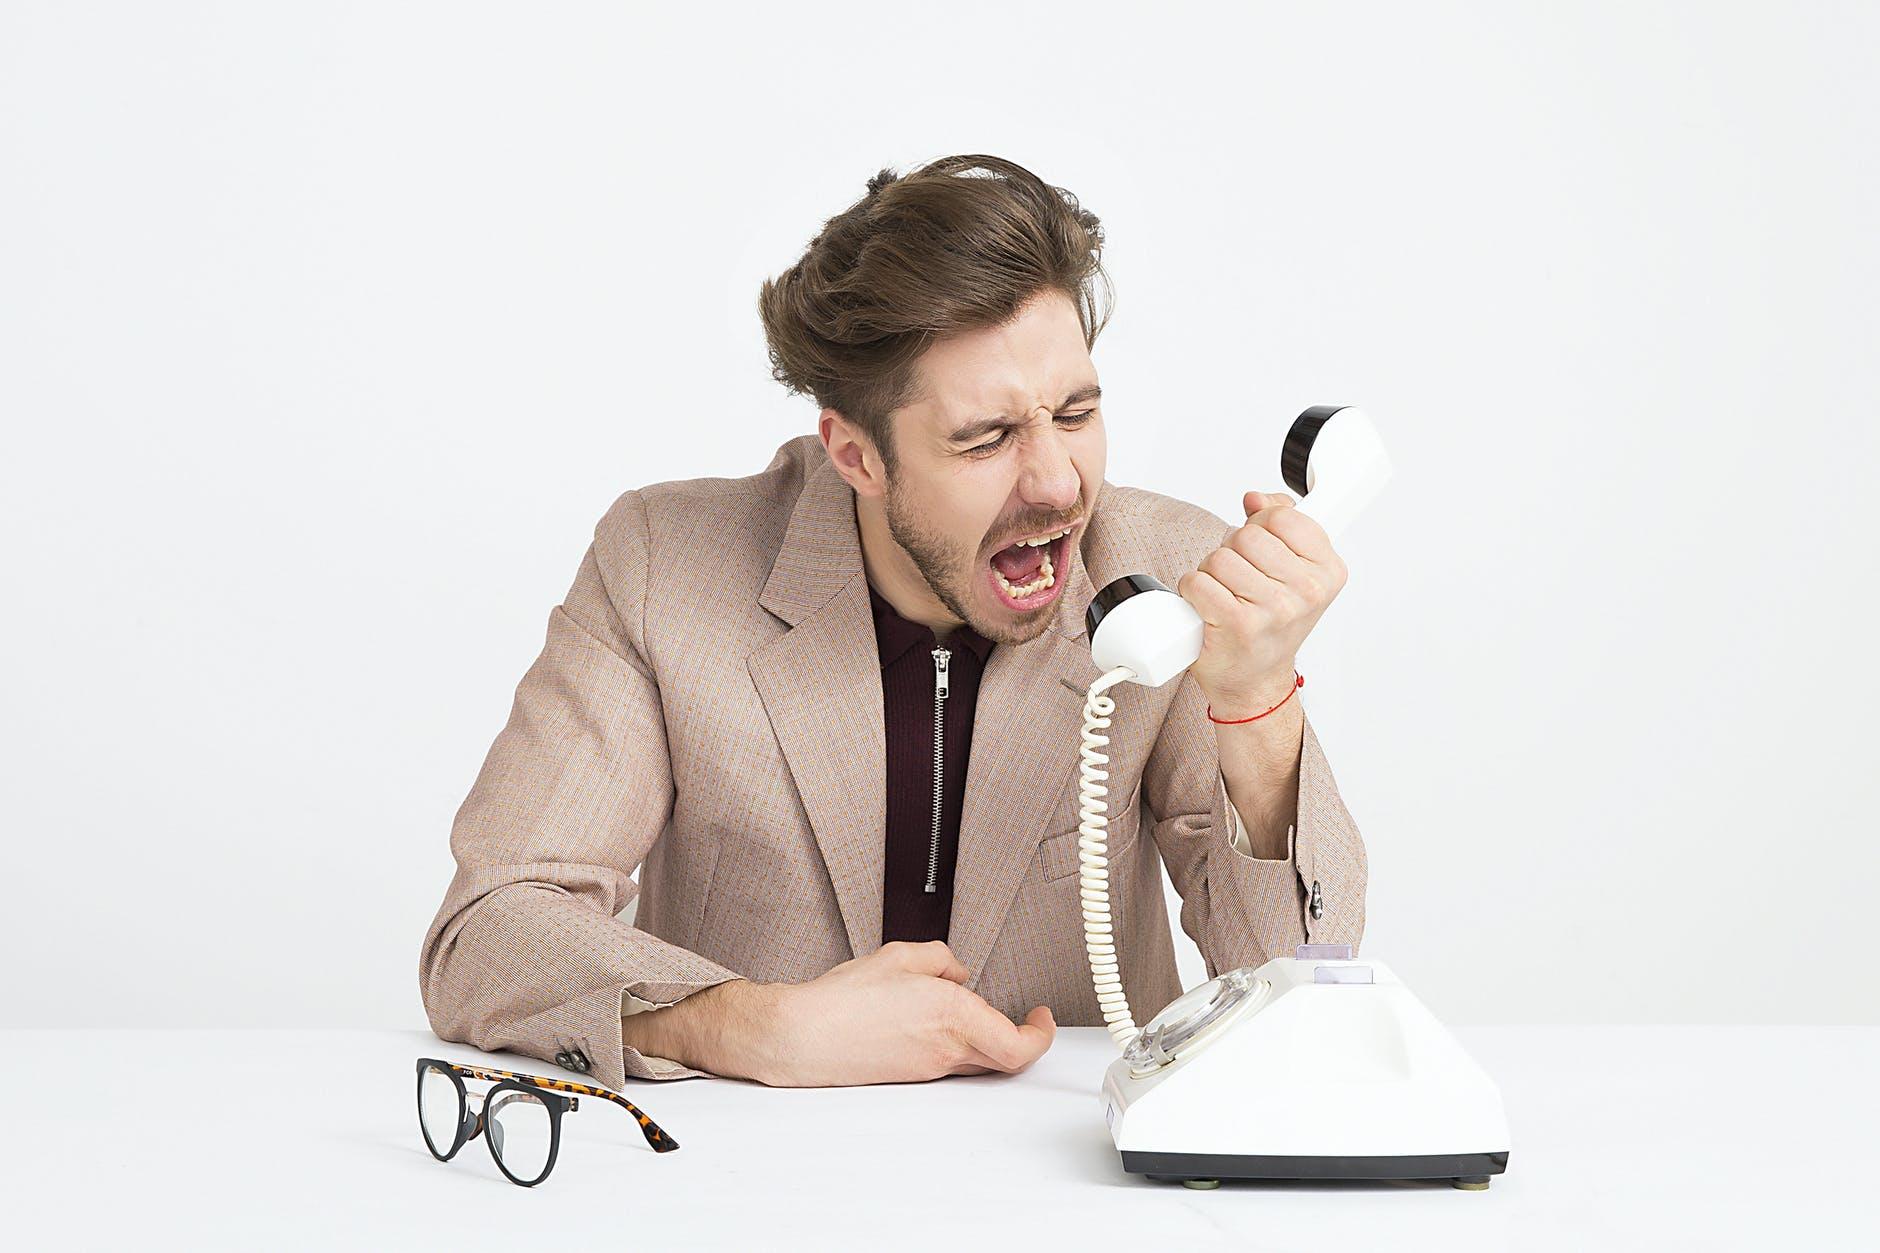 Swearing and abusive language misconduct